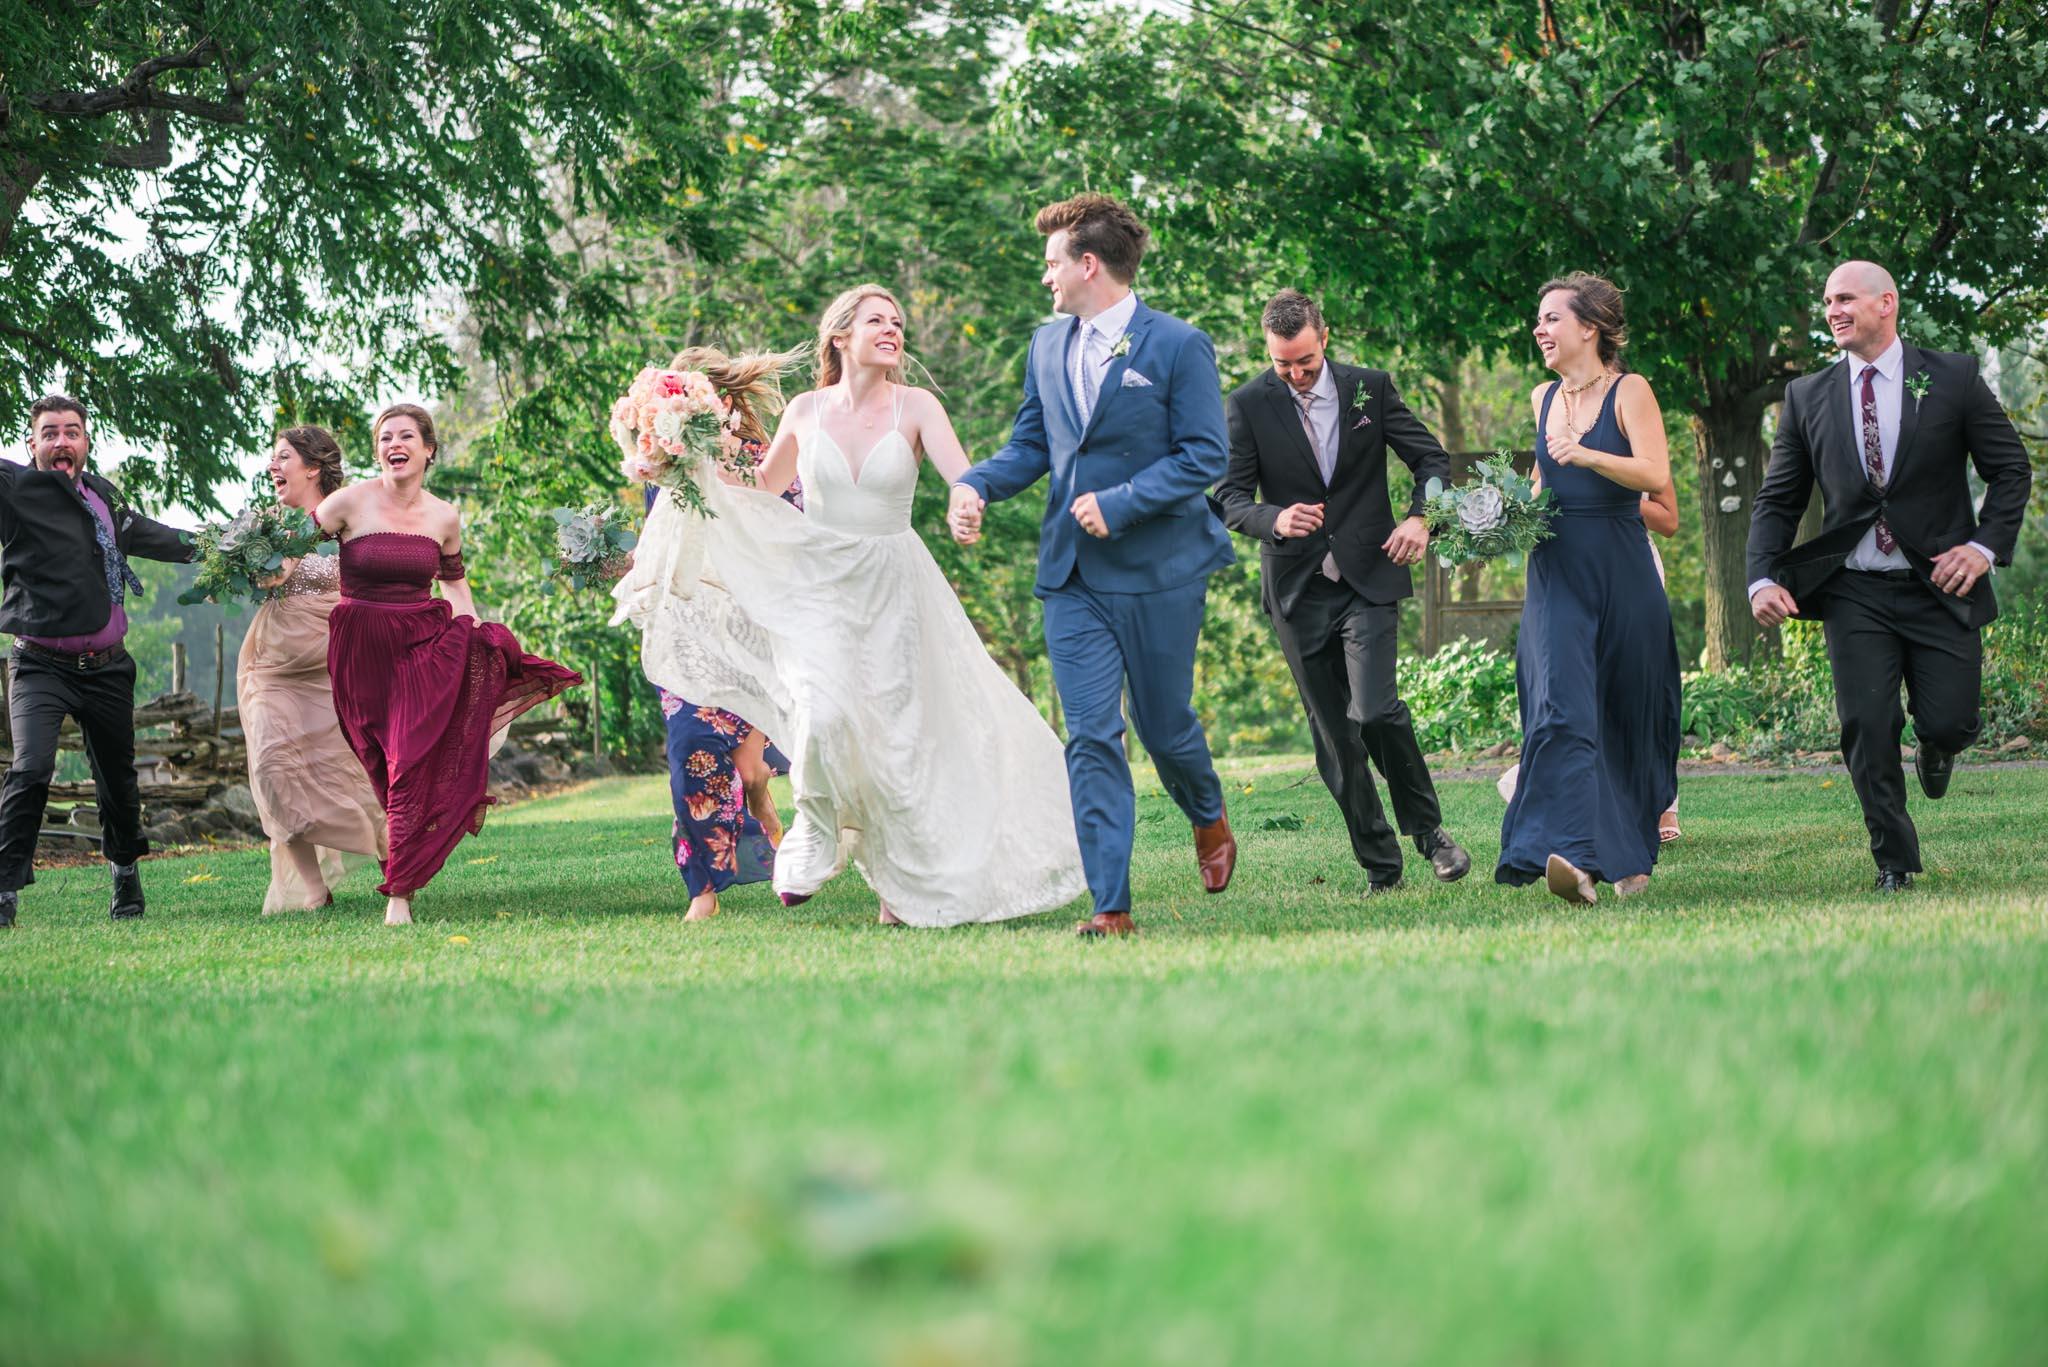 Tornado wedding Stanleys olde maple farm-0249.JPG